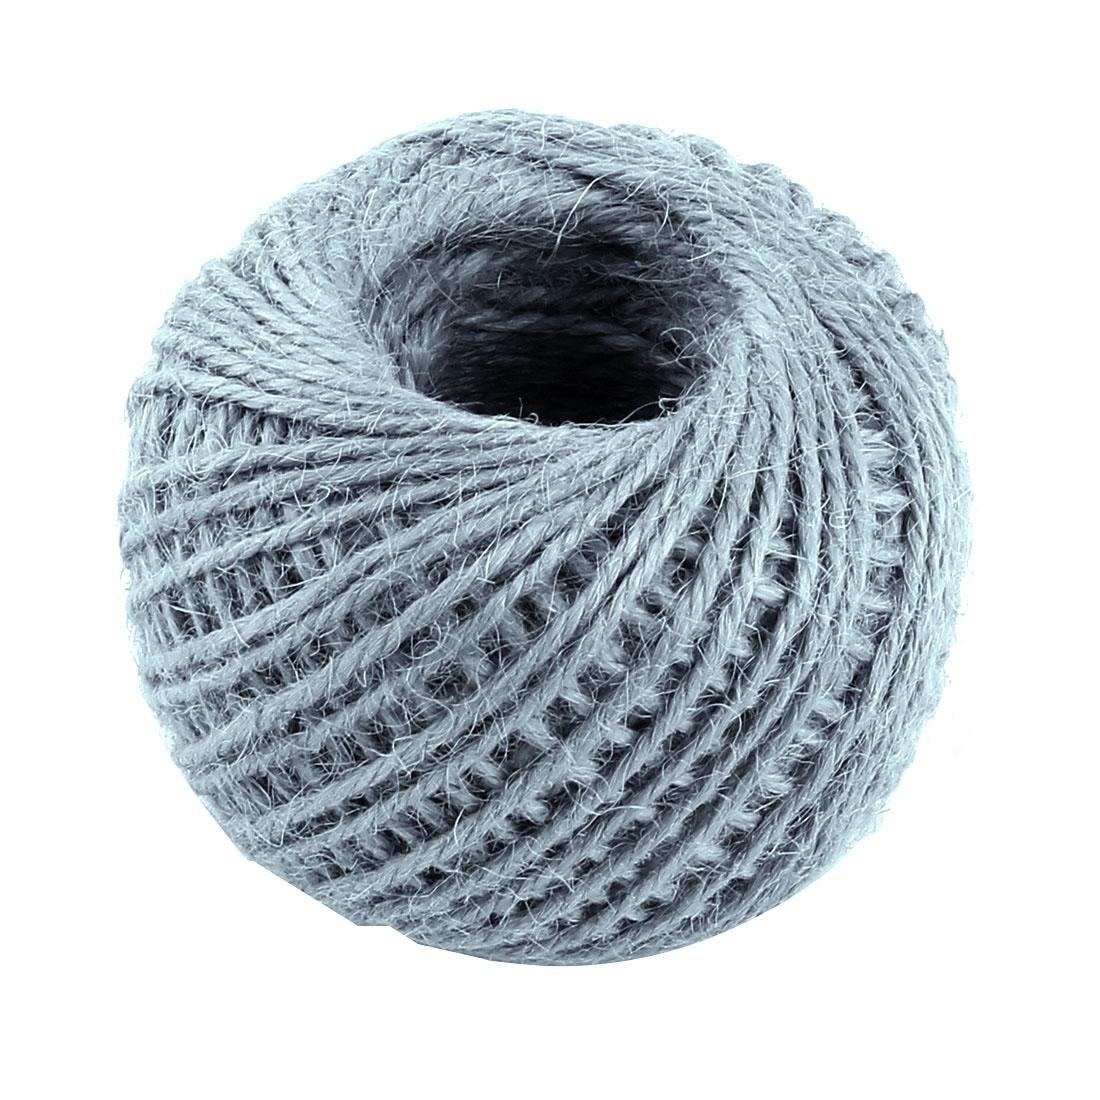 Jute Burlap Ribbon Twine Rope Cord String Wrap Roll Gray 2mm Dia 50m Length